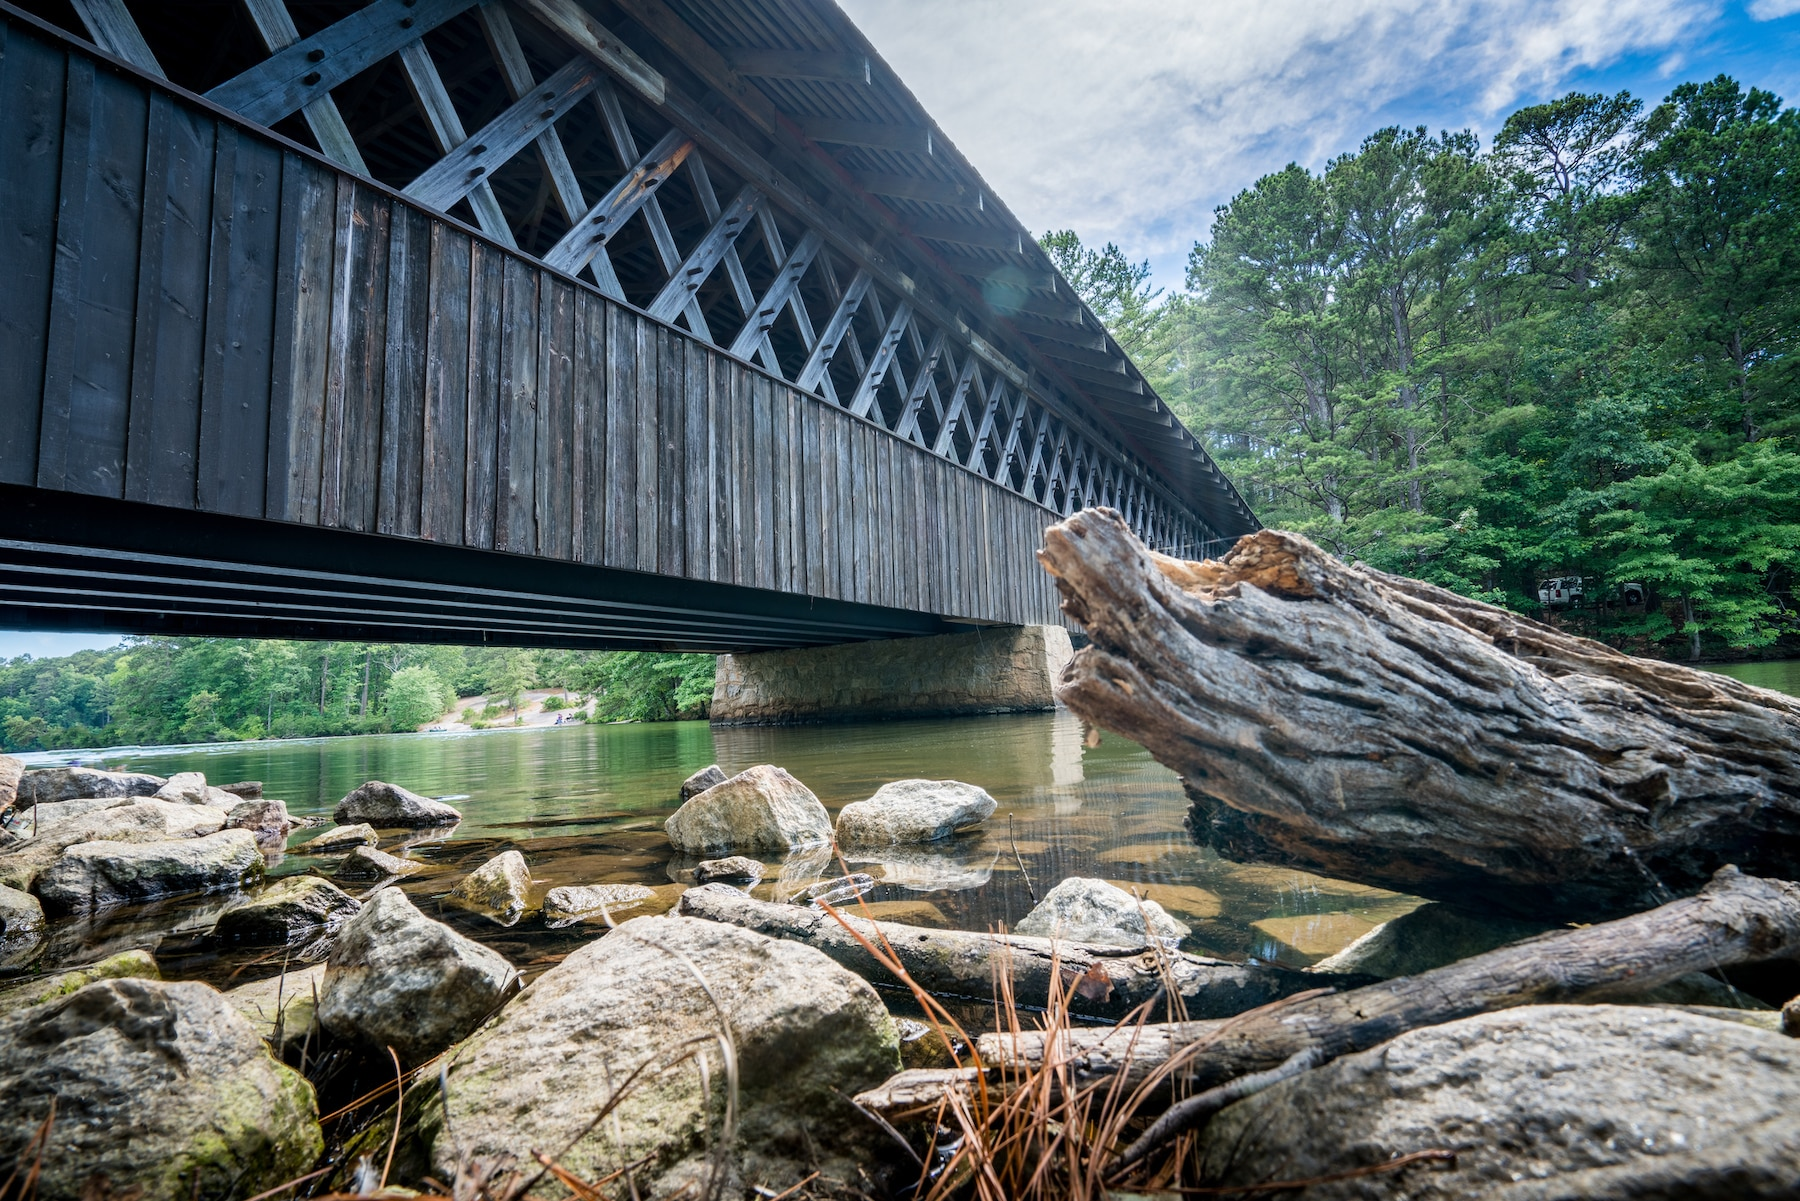 Covered bridge, Stone Mountain Georgia